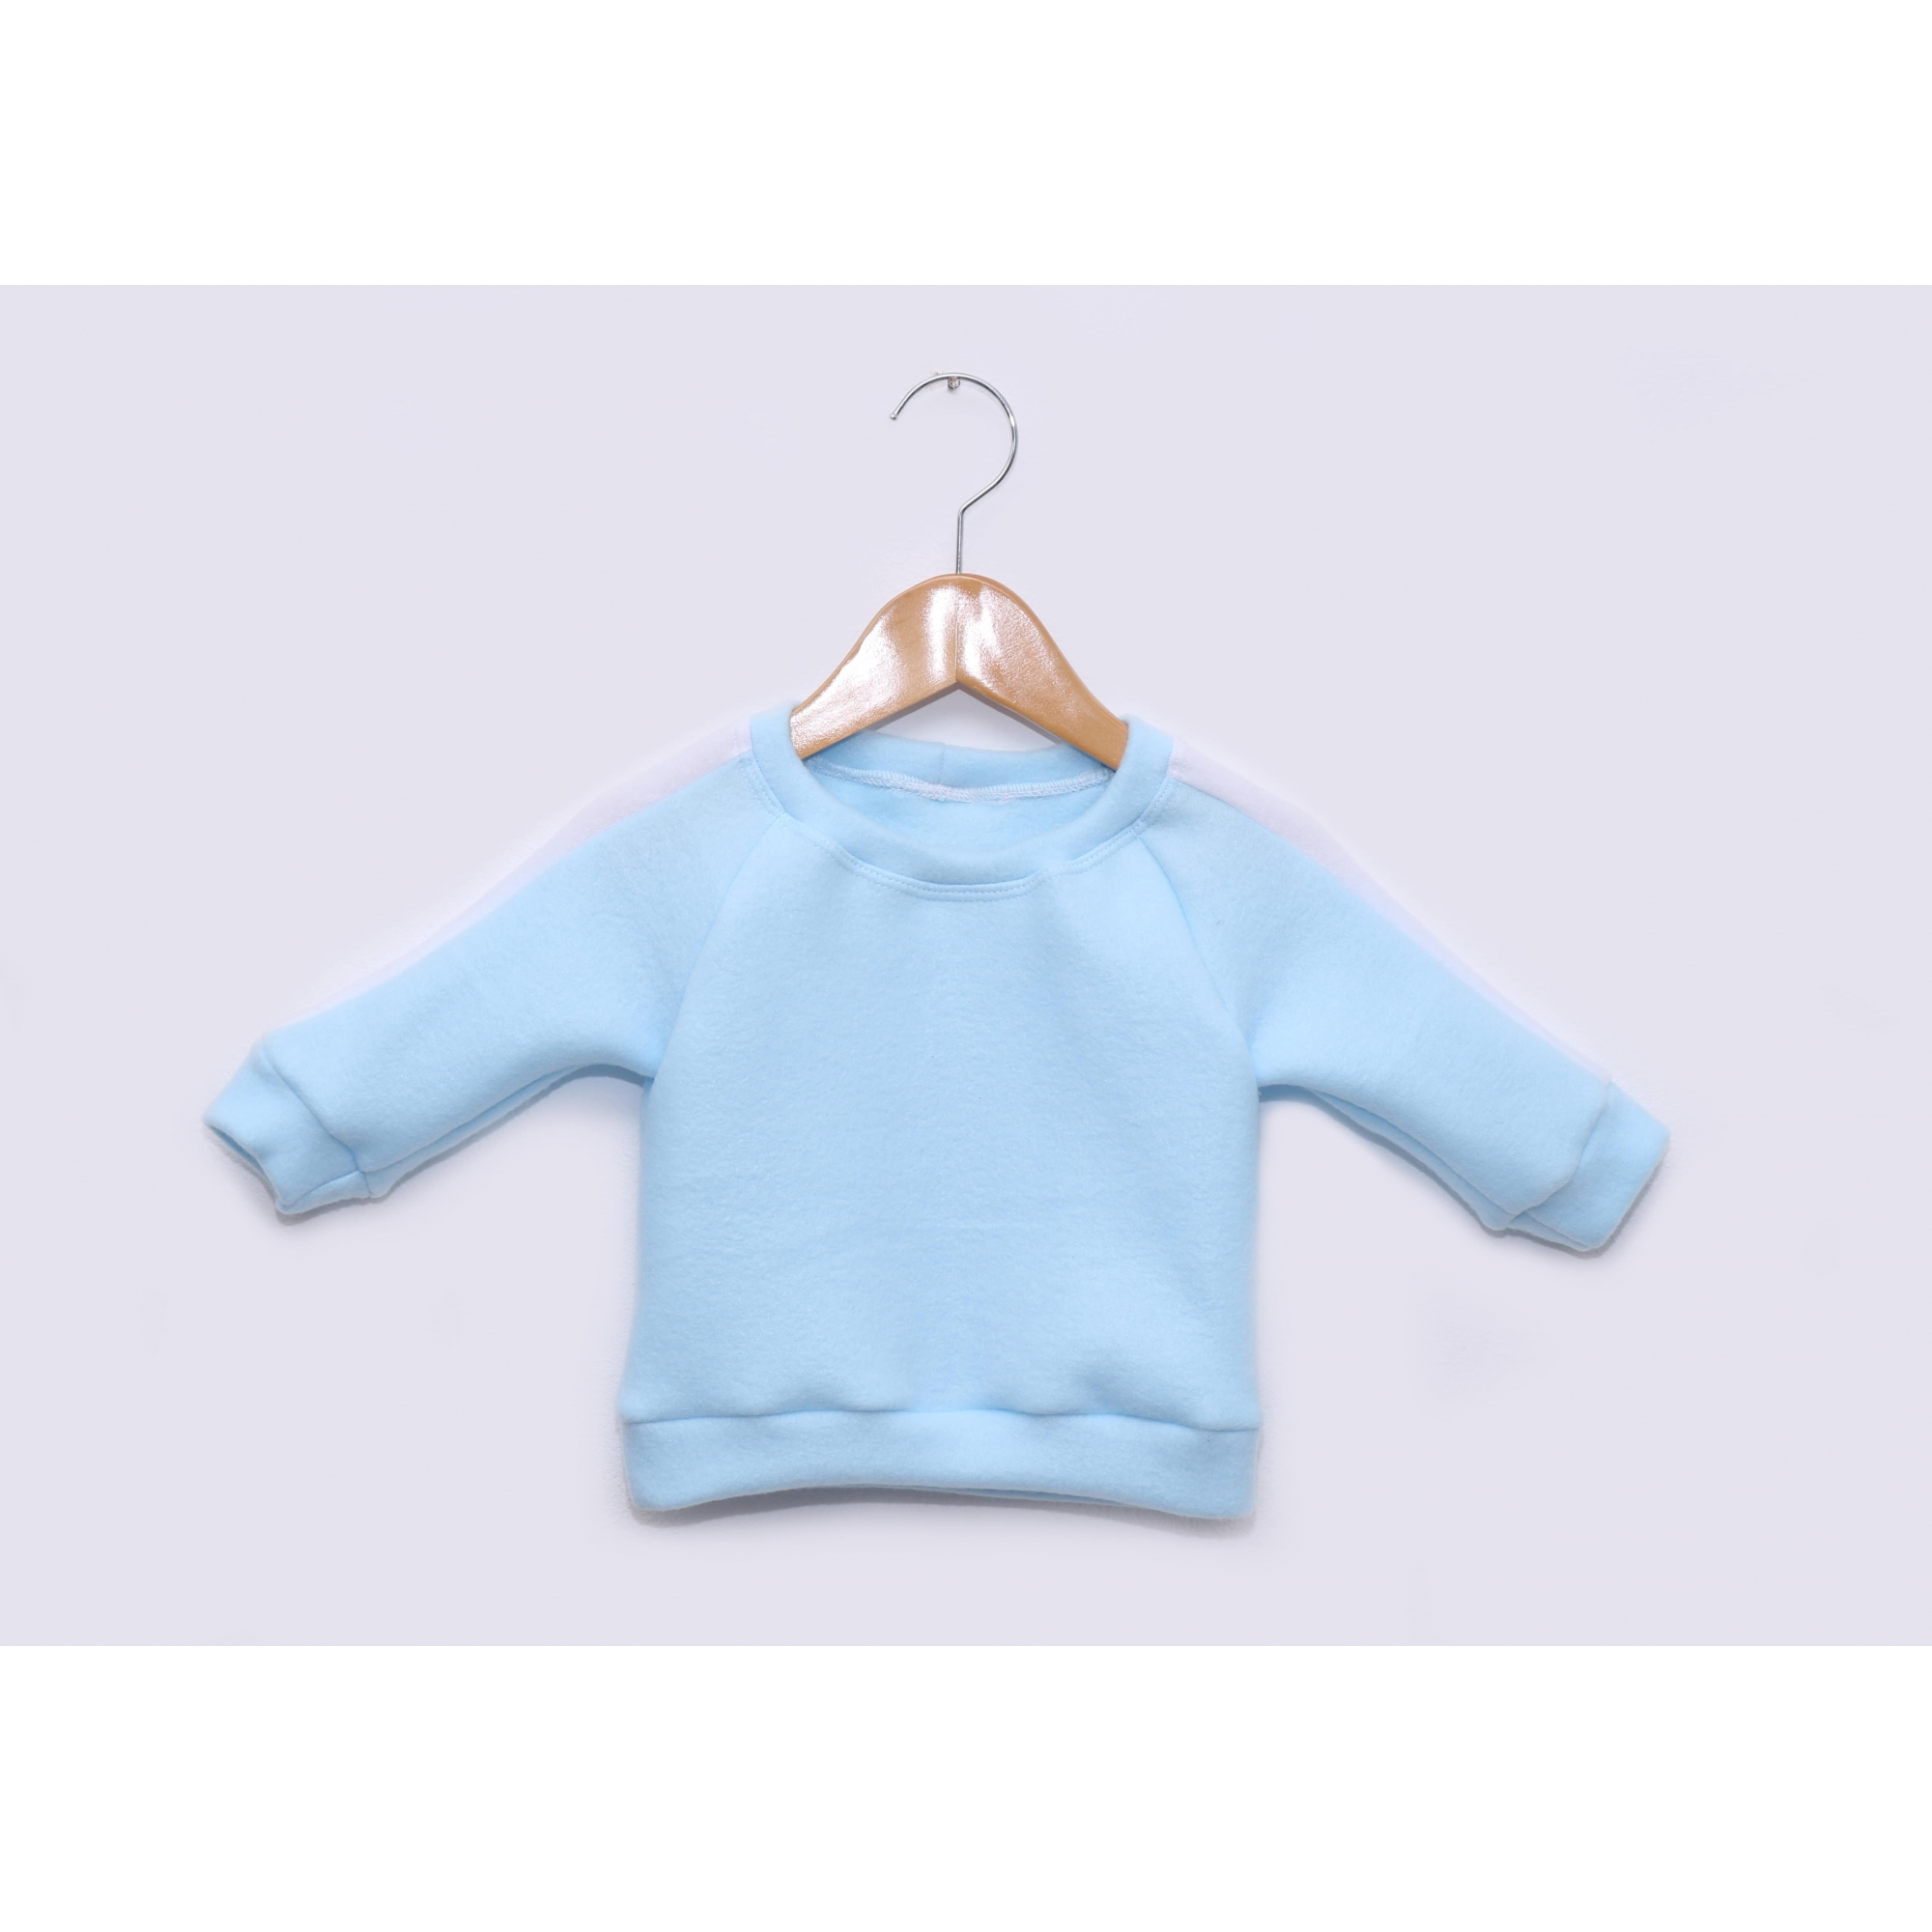 Pijama Bebê em Soft Fleece Azul